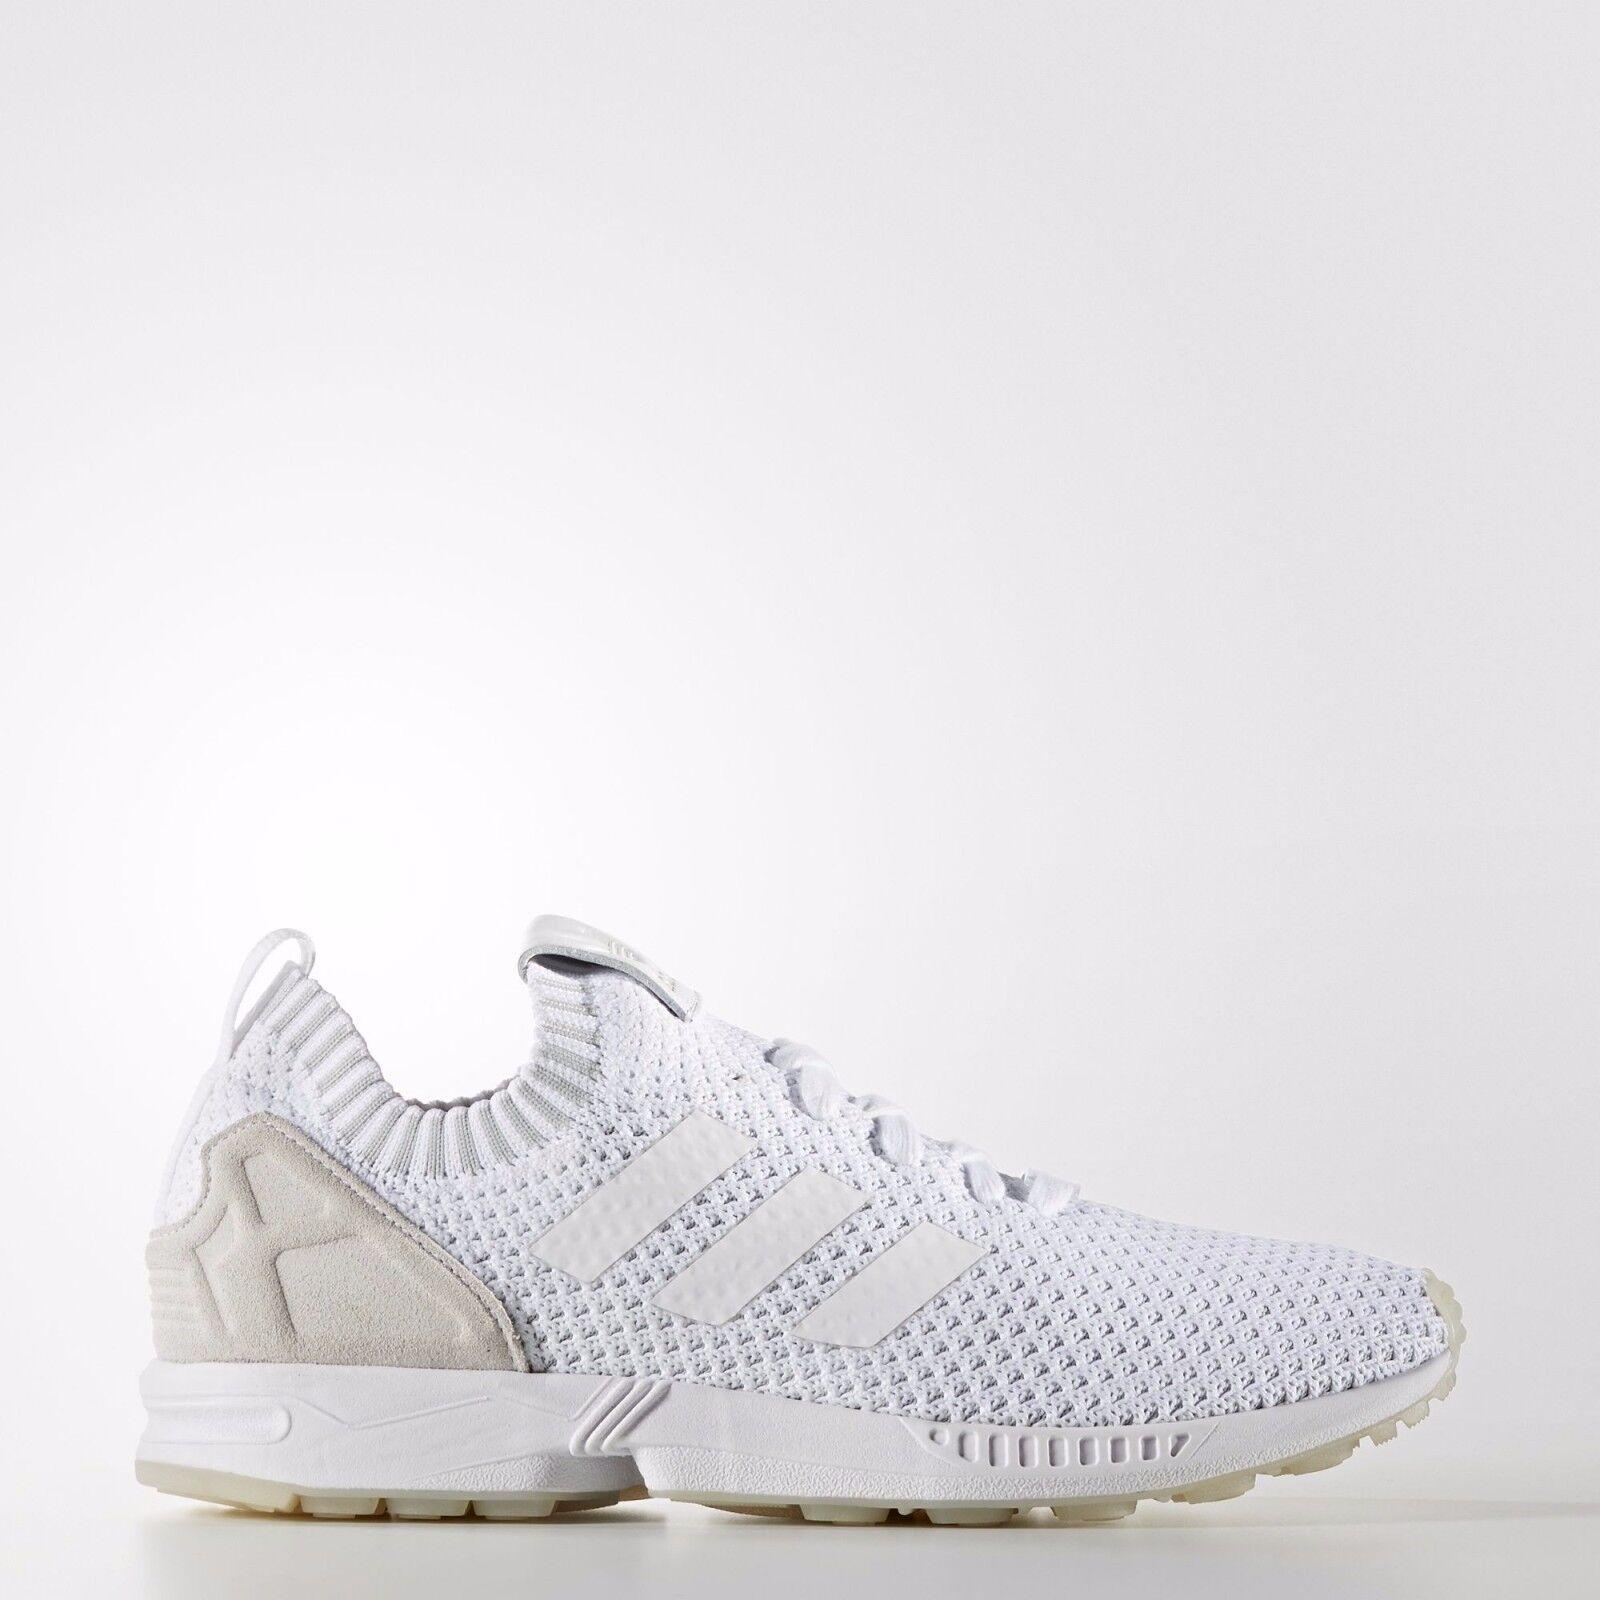 Adidas Originals Men's ZX FLUX PRIMEKNIT Shoes Running White S75977 a